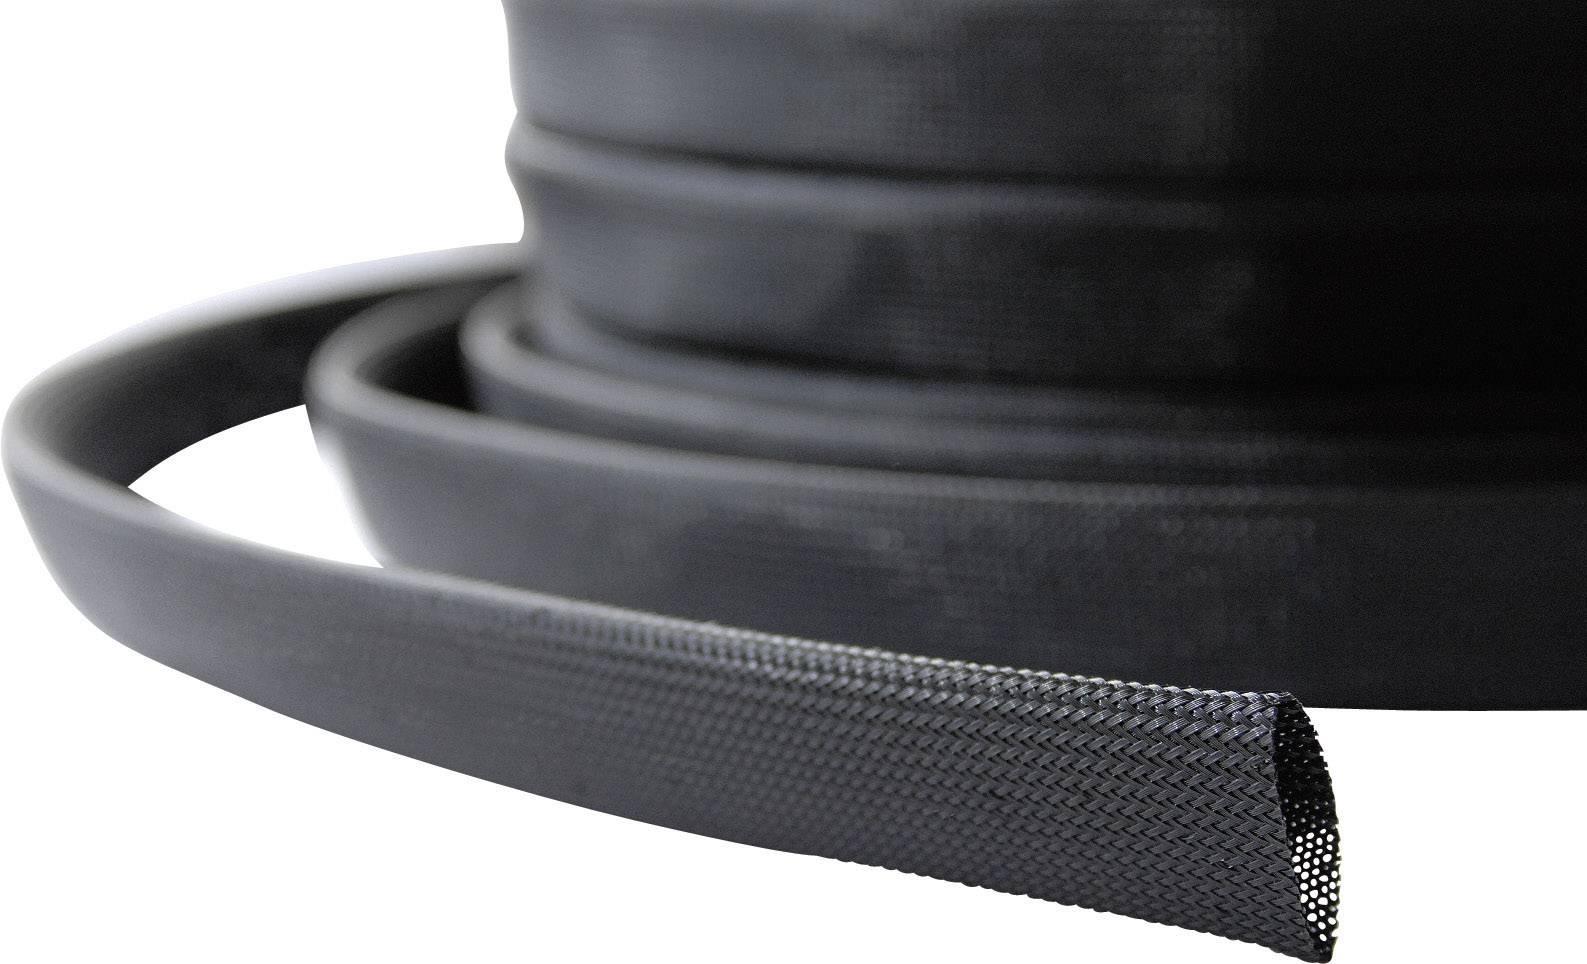 Ochranný oplet LappKabel SILVYN® BRAID PA6 NW, 26 do 36 mm, -55 do +125 °C, 10 m, čierna